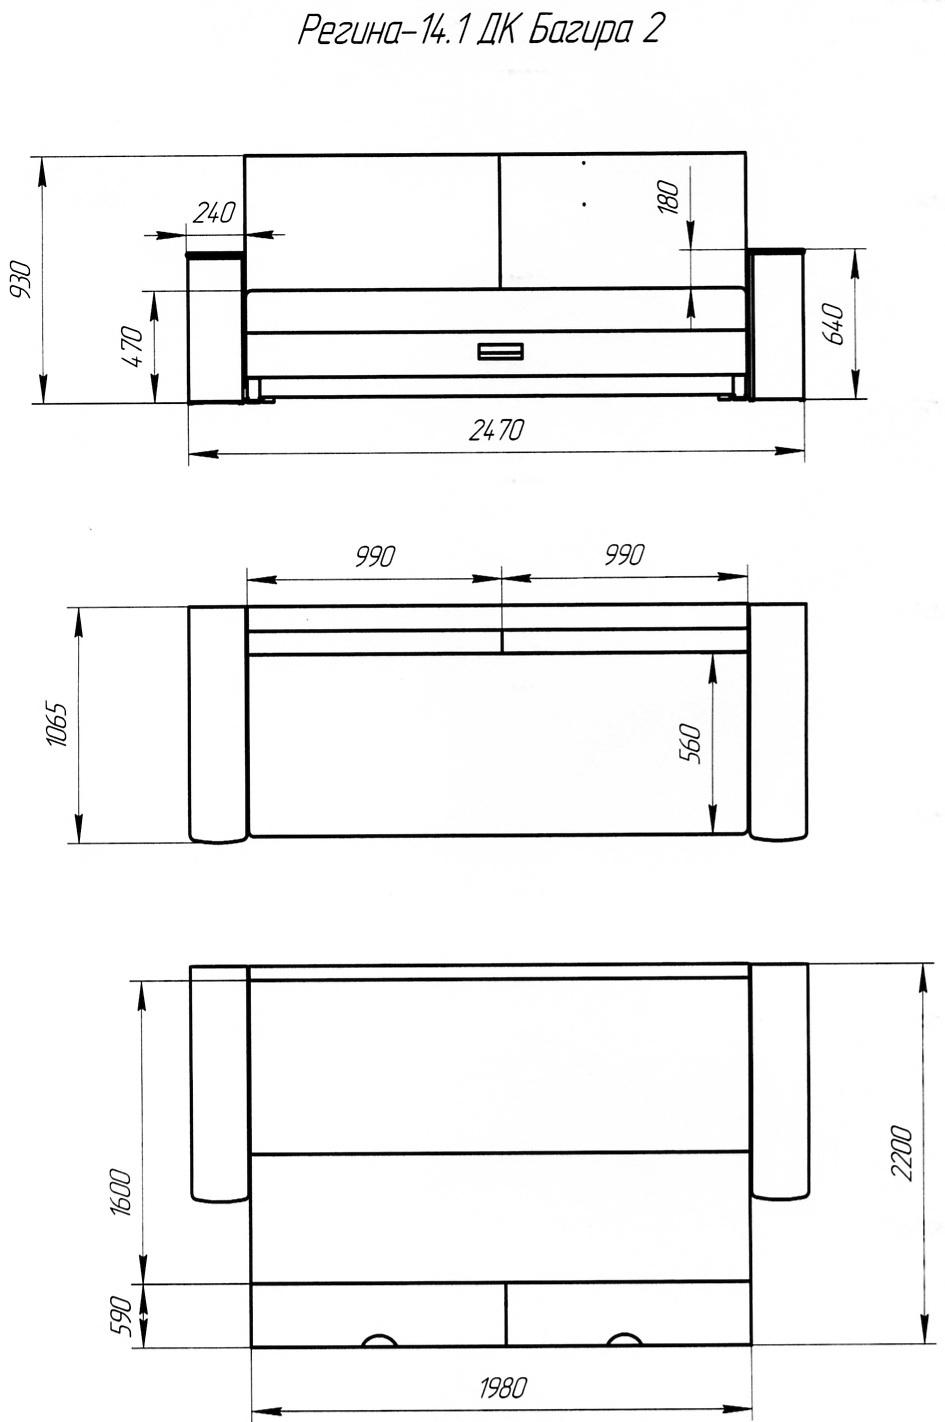 диван багира 2 размеры